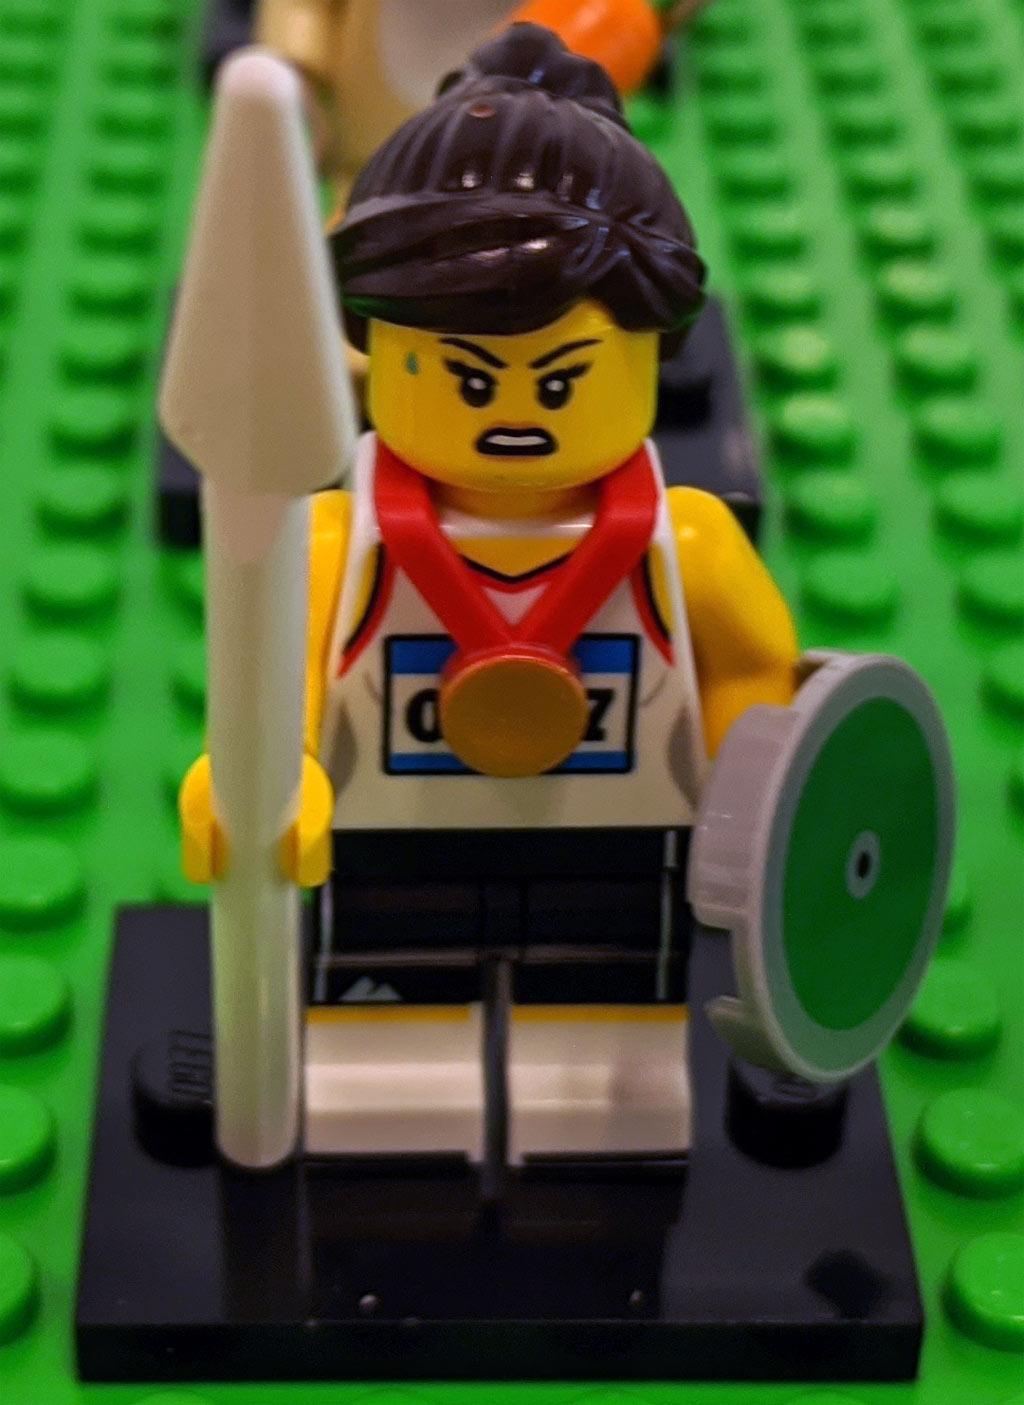 lego-minifiguren-sammelserie-20-71027-sportlerin-zusammengebaut-2020-andres-lehmann zusammengebaut.com